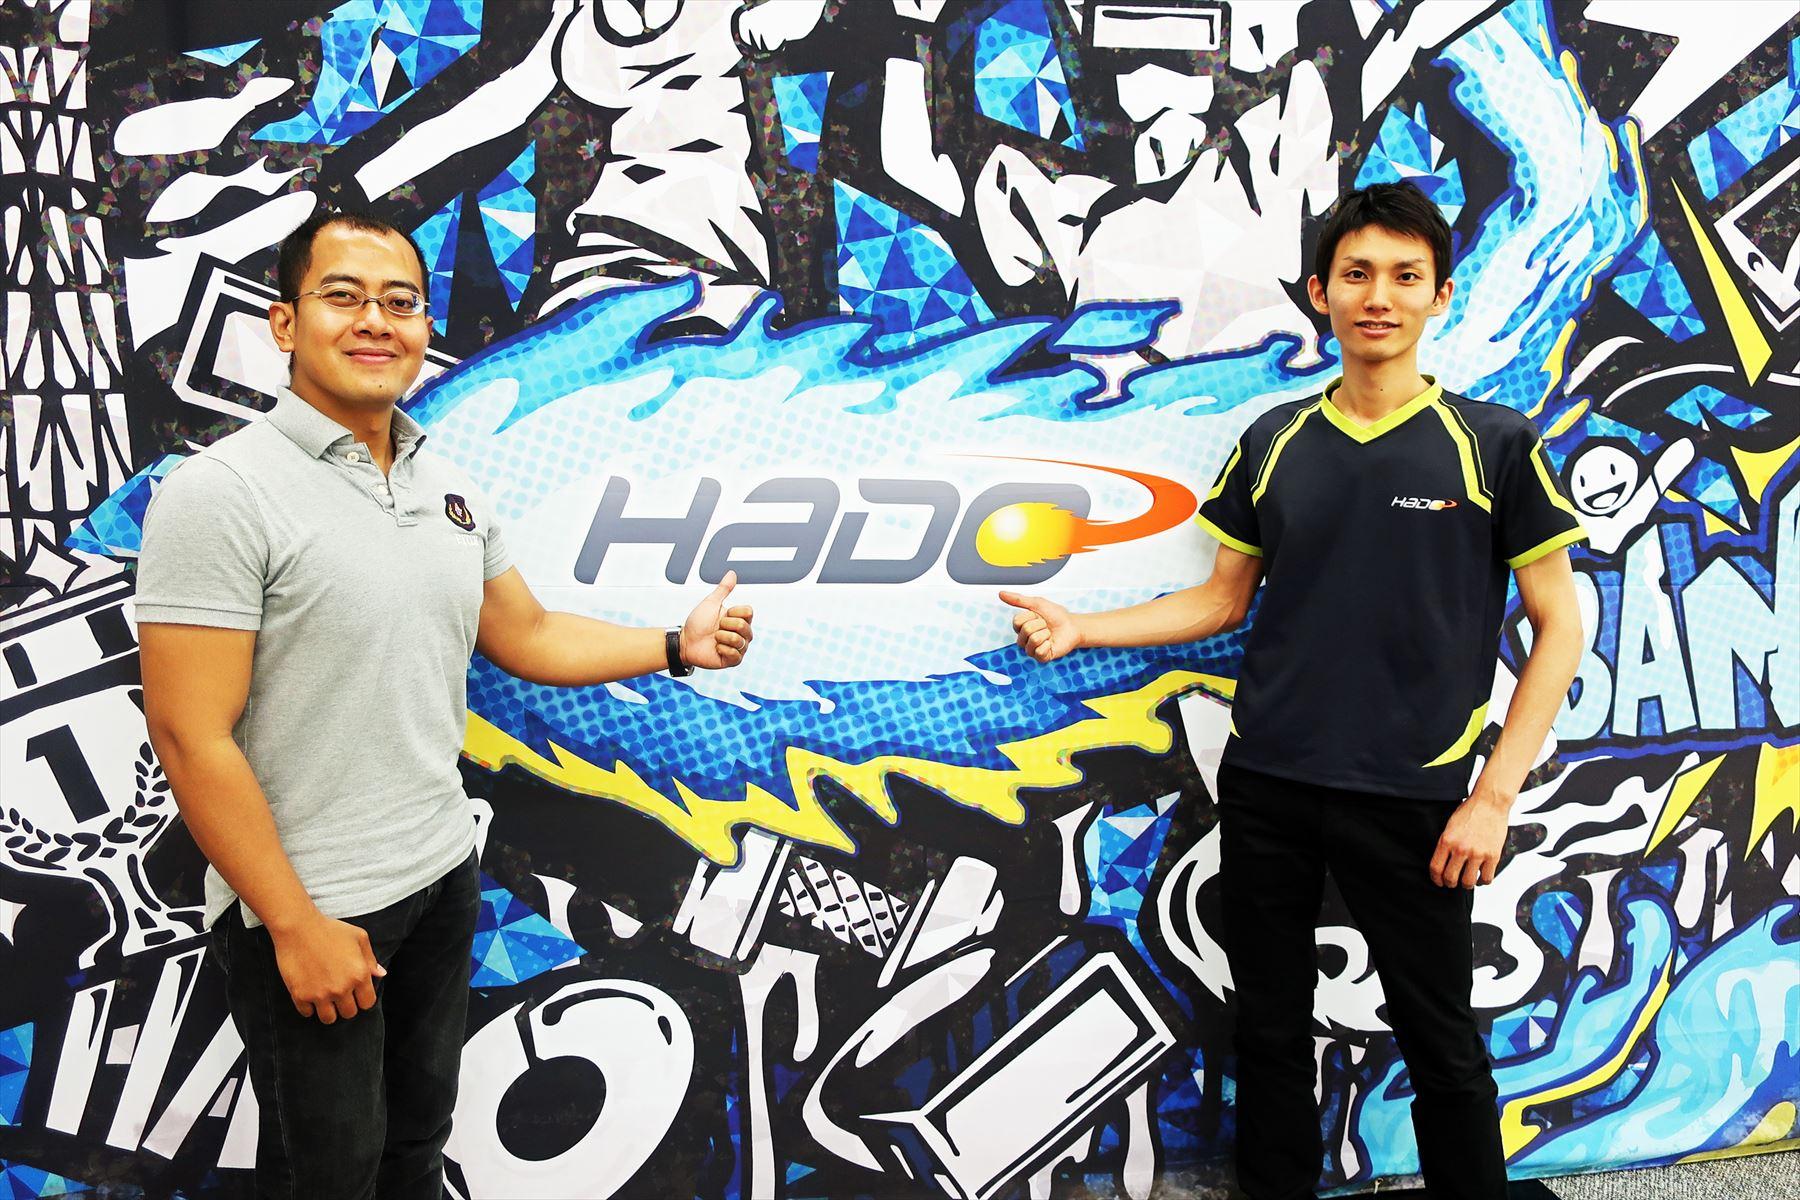 meleap CEO福田浩士氏(右)DG Lab VRAR CTOアディヤン ムジビヤ(左)